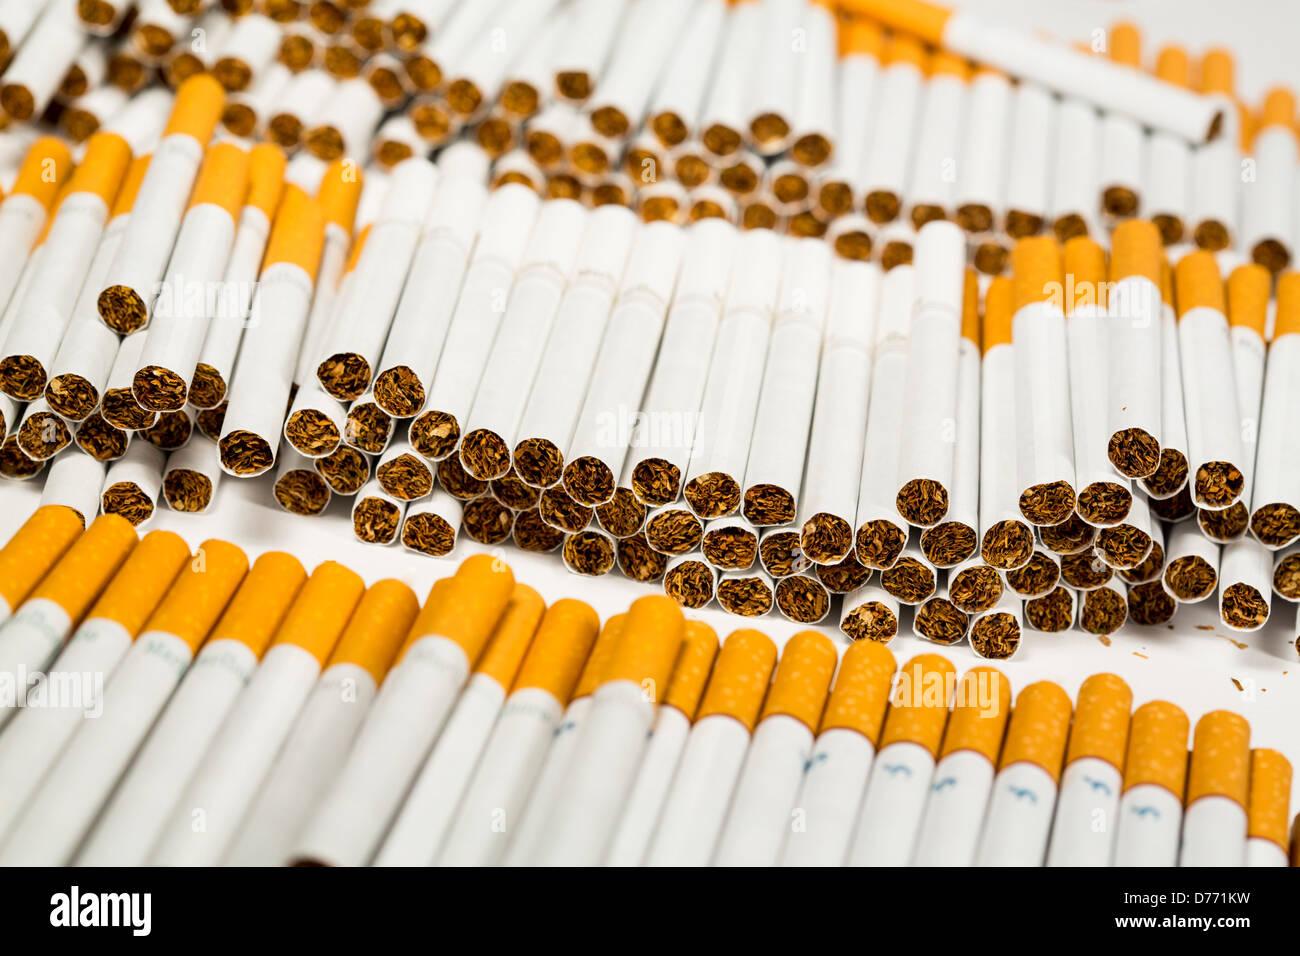 Marlboro cigarettes India price